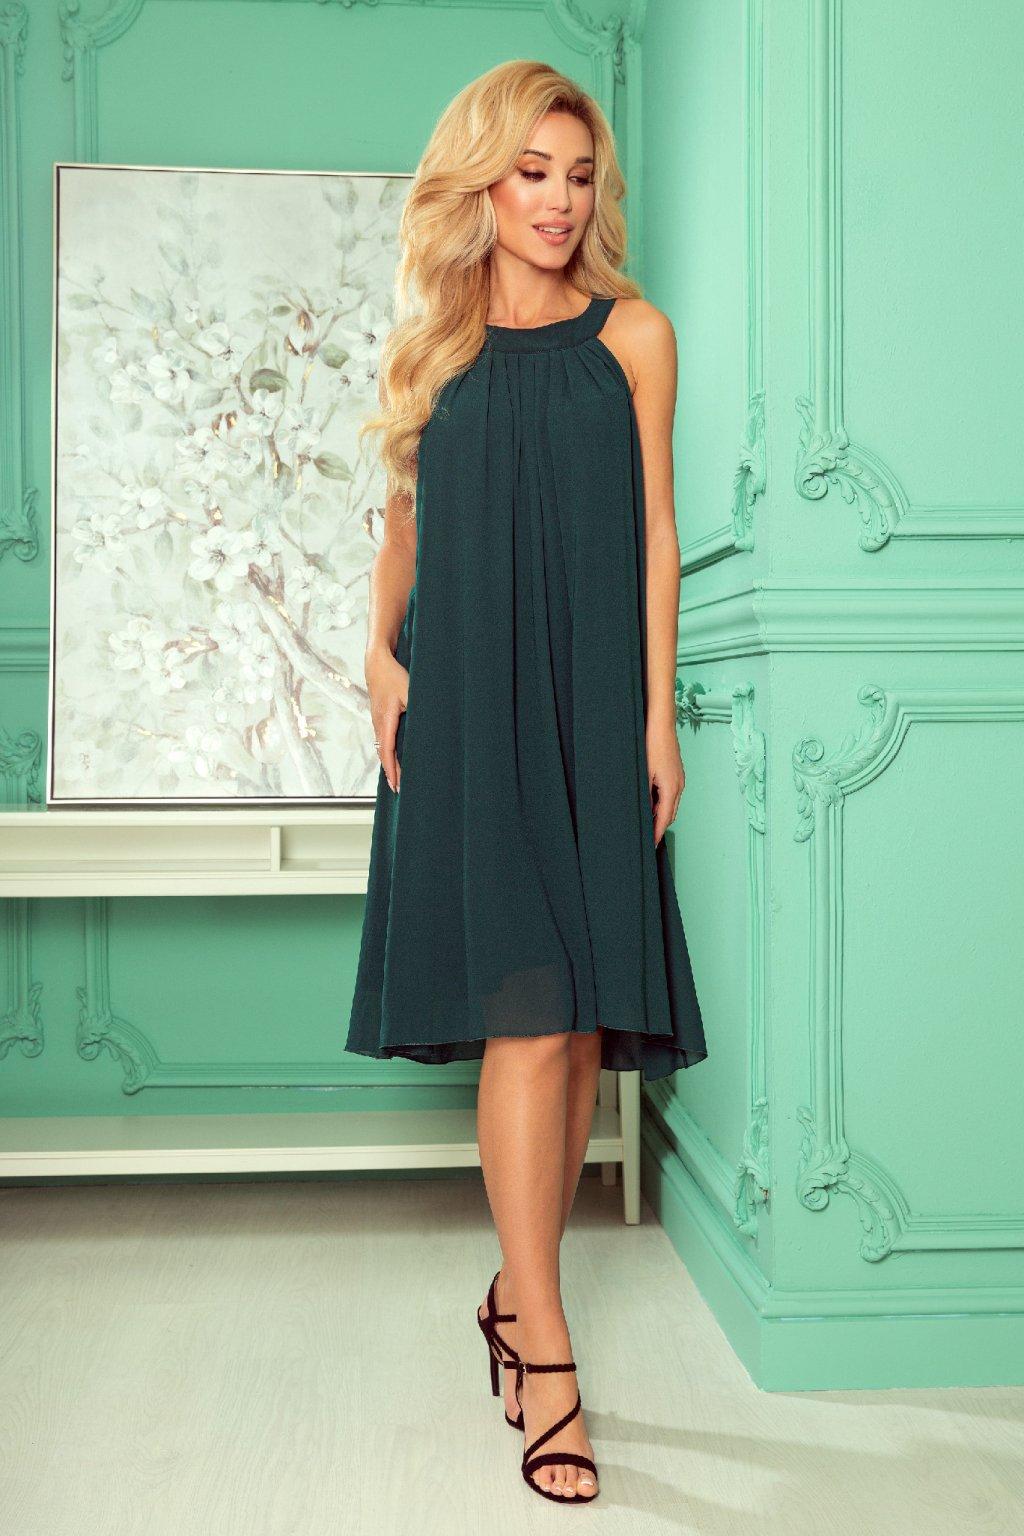 Tmavozelené krátke šifónové šaty